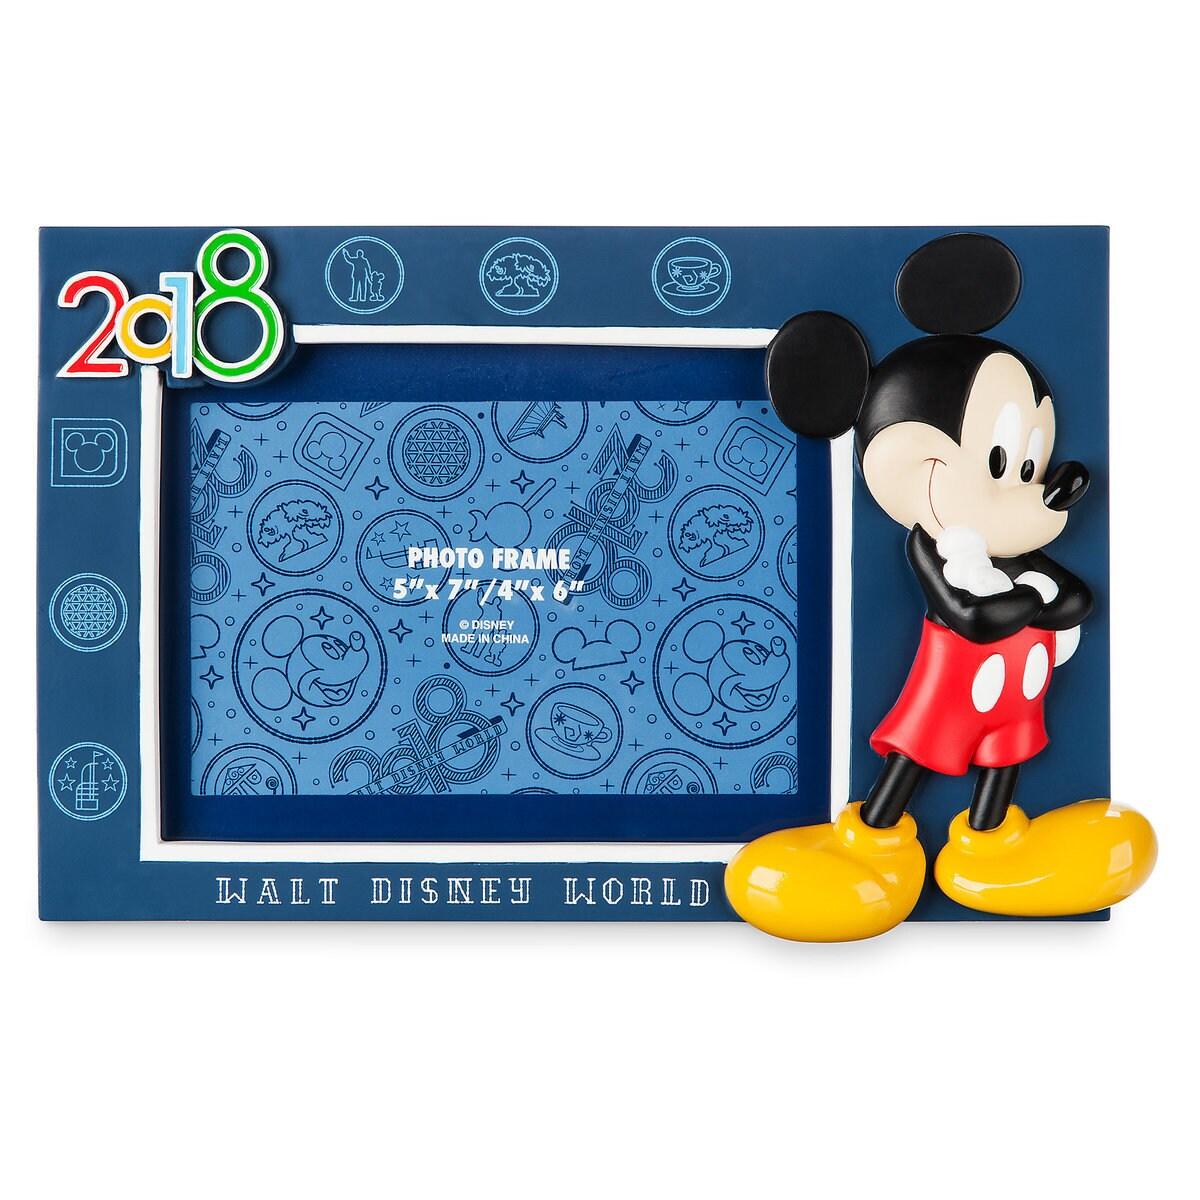 Mickey Mouse Photo Frame - Walt Disney World 2018 | shopDisney